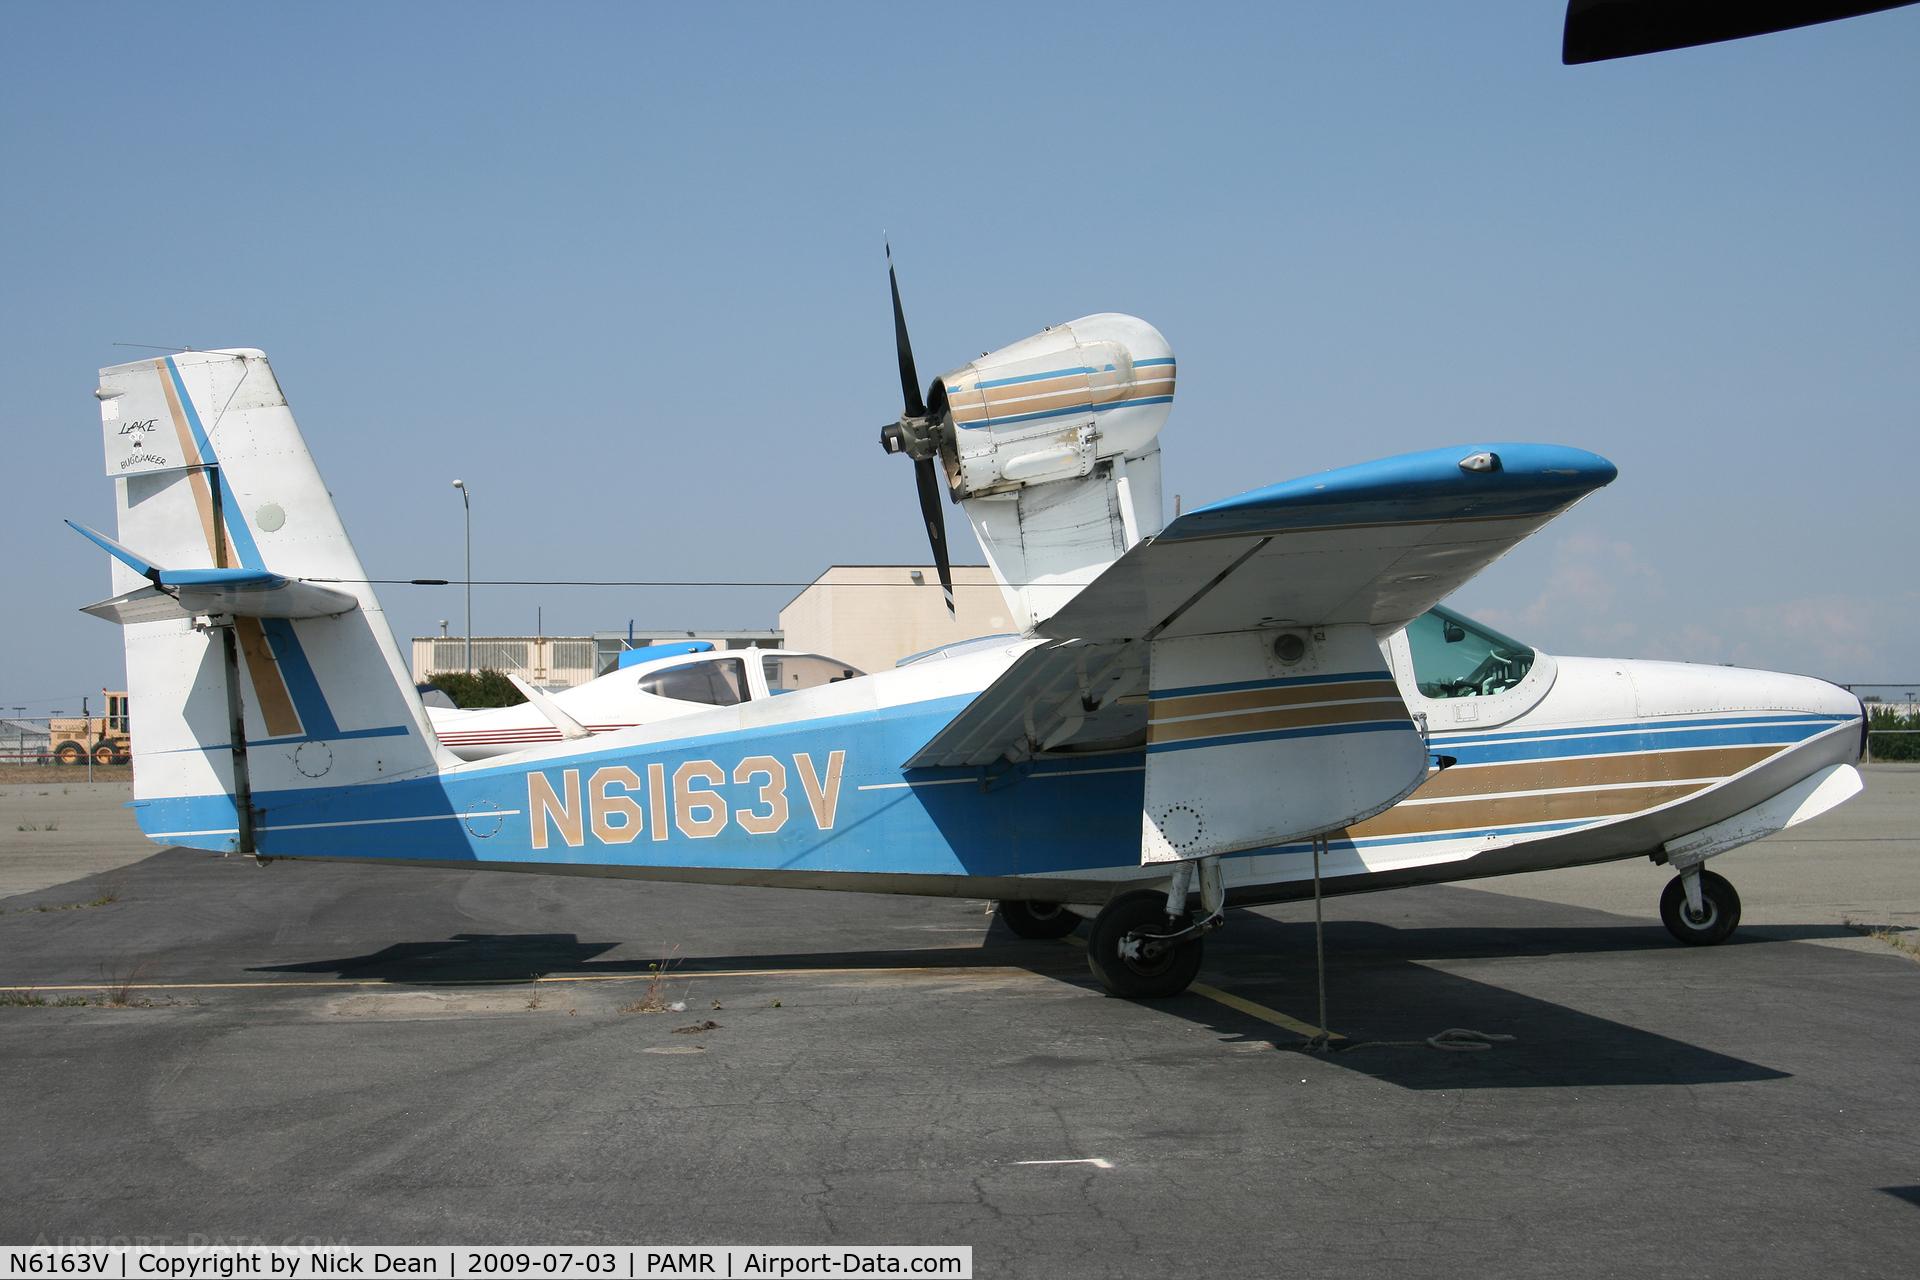 N6163V, 1977 Consolidated Aeronautics Inc. LAKE LA-4-200 C/N 816, PAMR